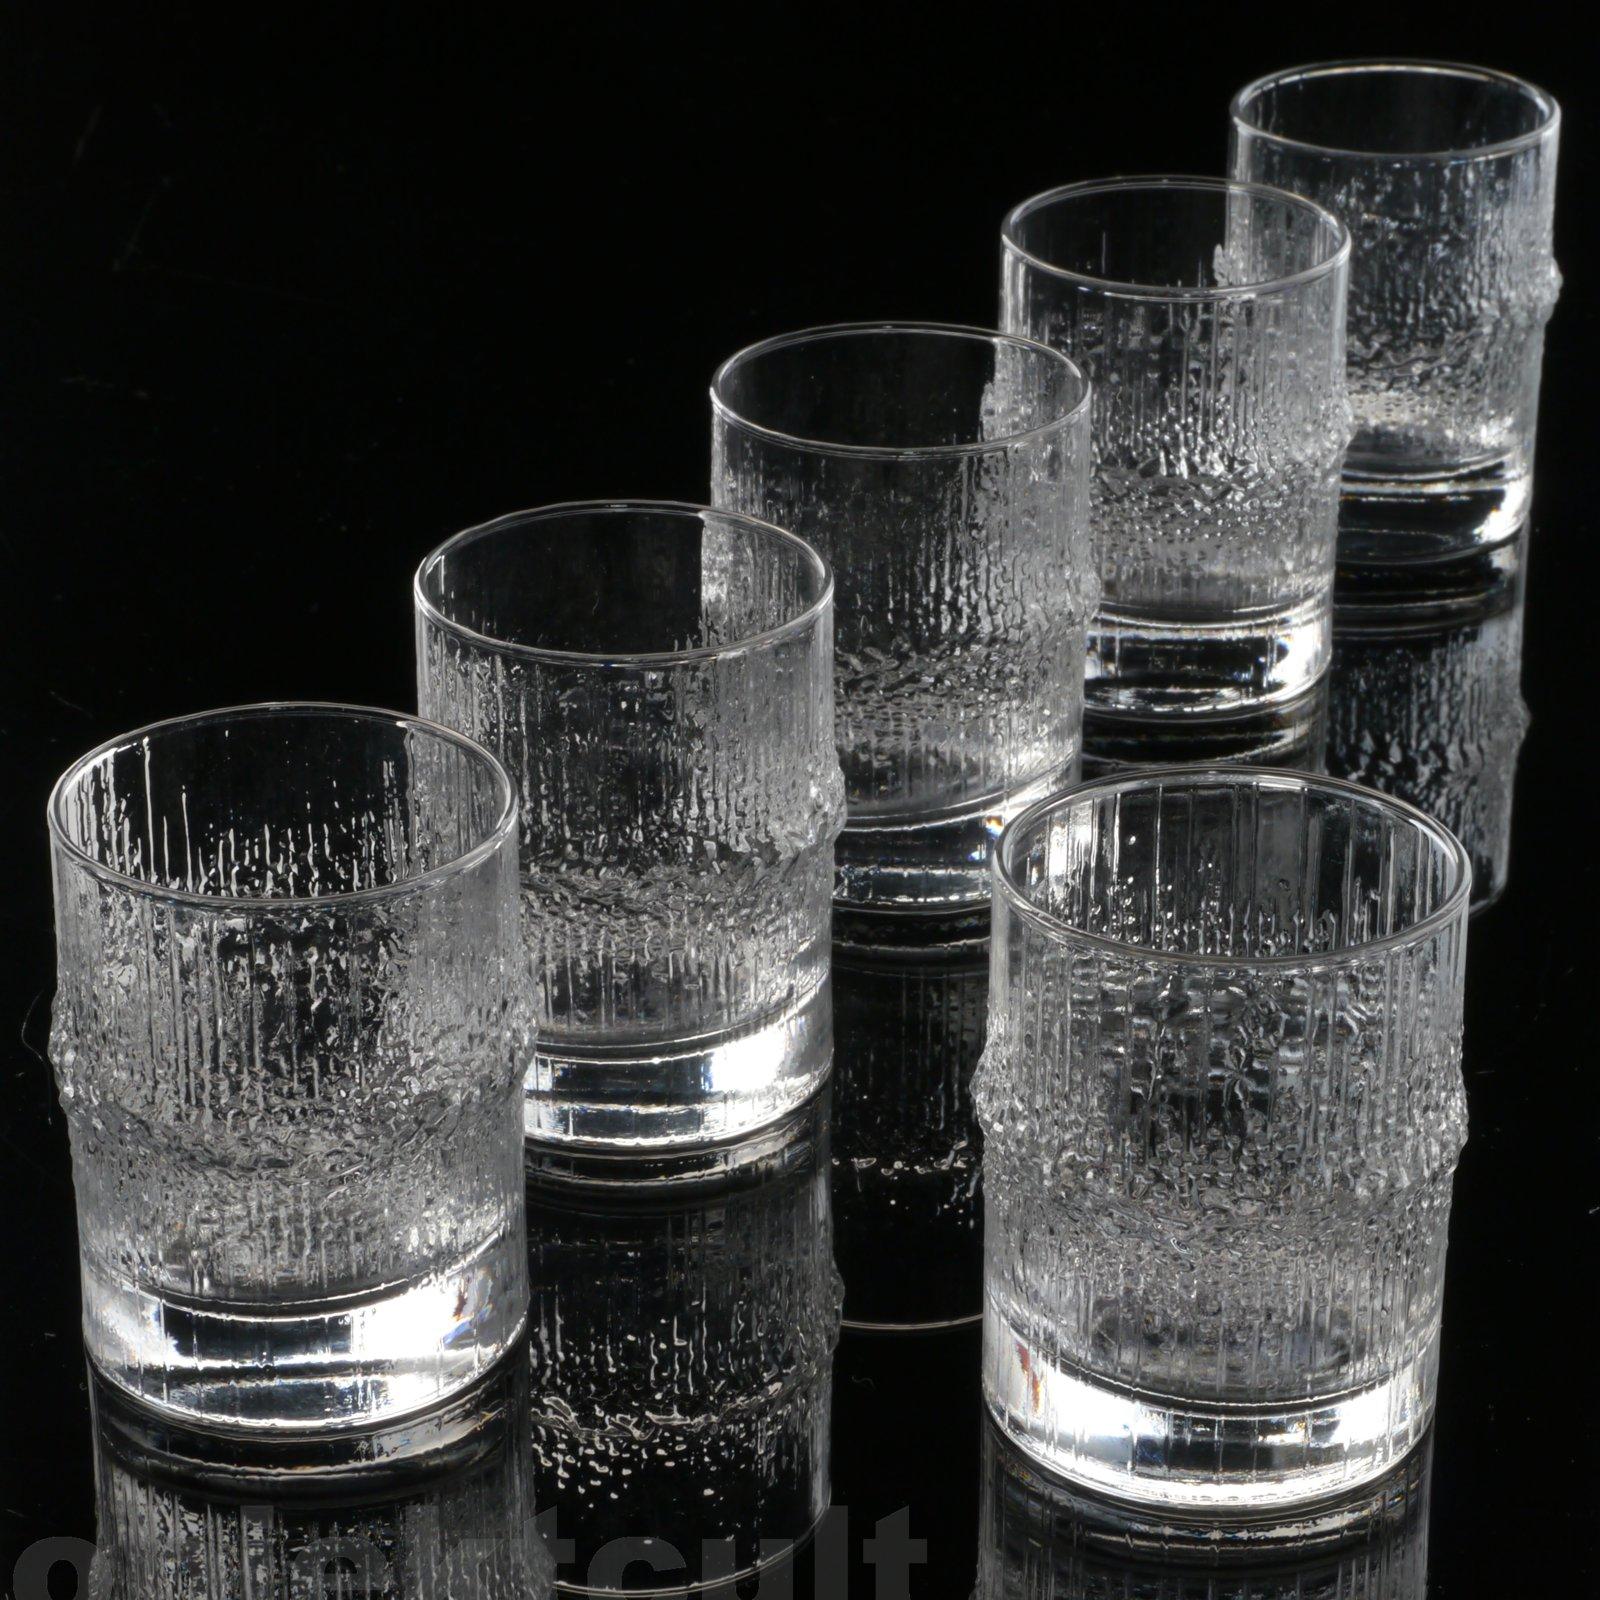 6x iittala t wirkkala sherry s dwein gl ser niva liqueur glasses sherry tumblers ebay. Black Bedroom Furniture Sets. Home Design Ideas